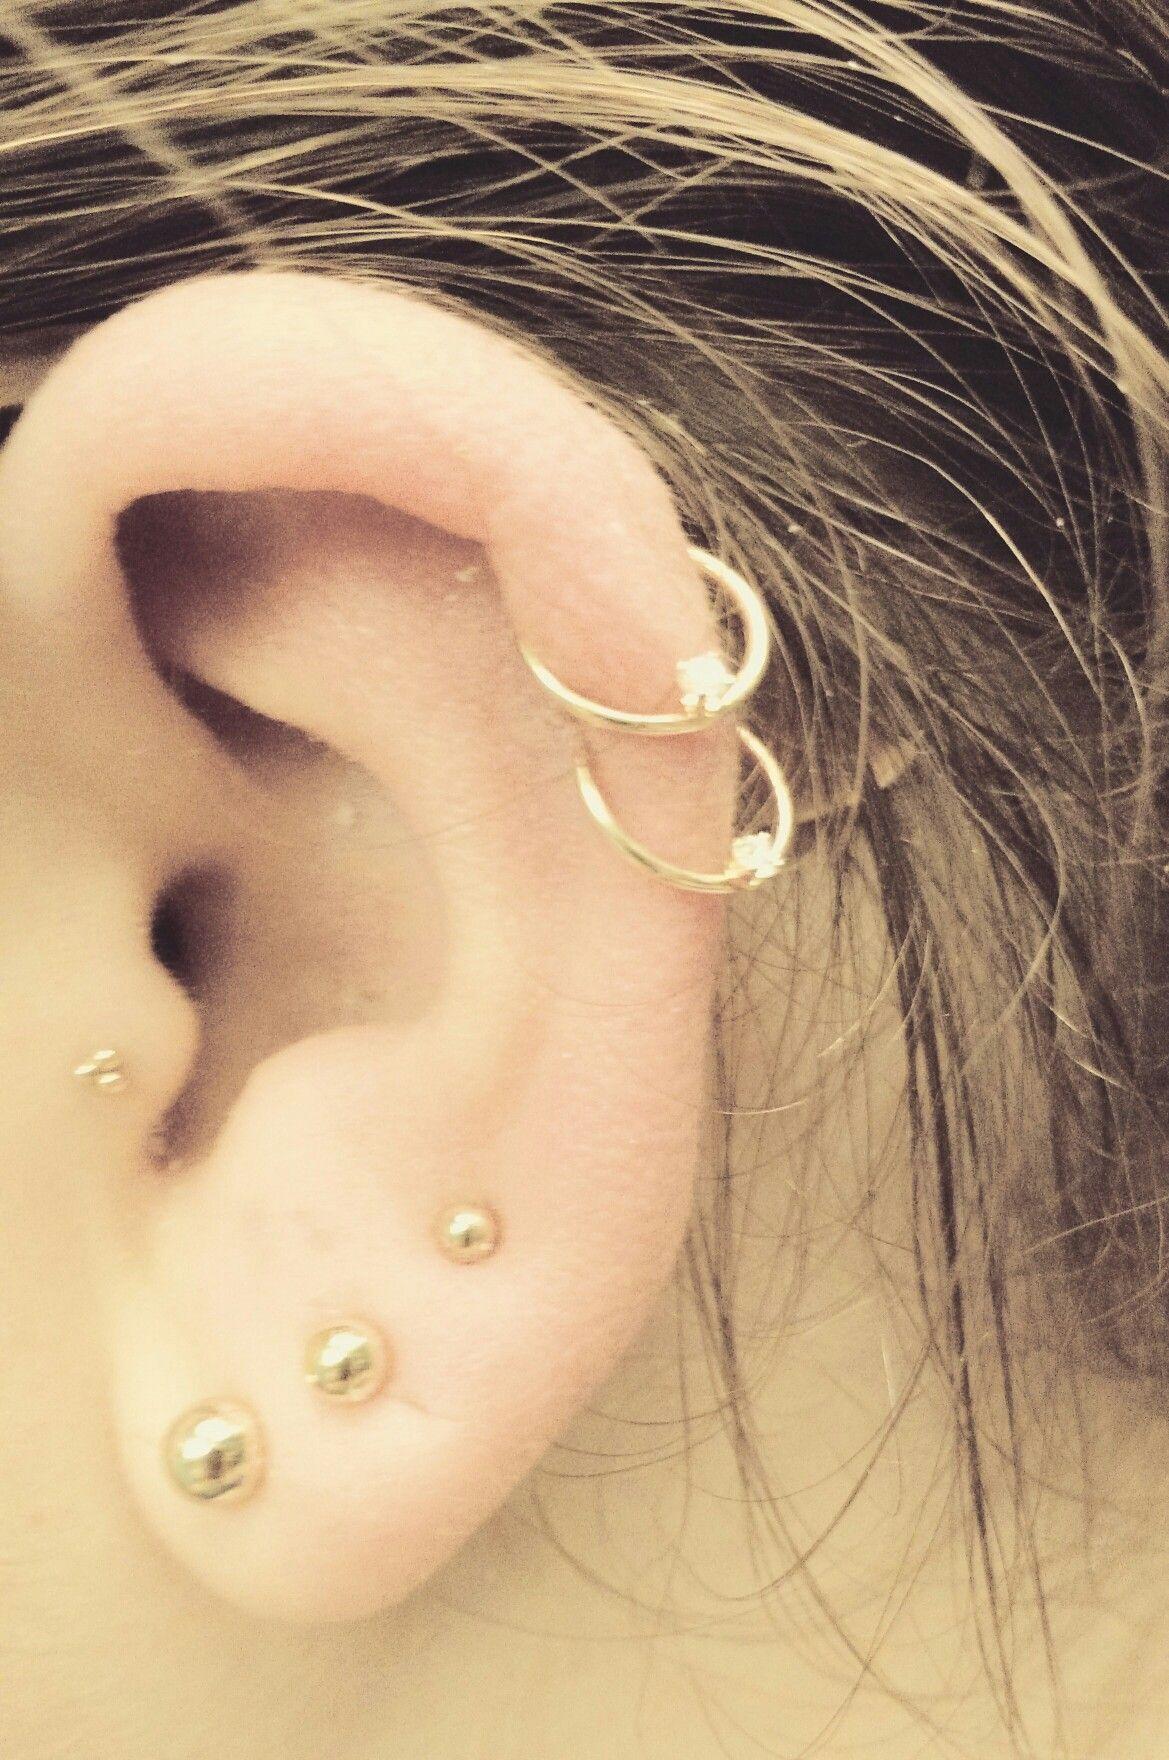 Double Helix, Tragus, 3 Lobe, Gold Earrings, Cartilage, Fashion, Multiple